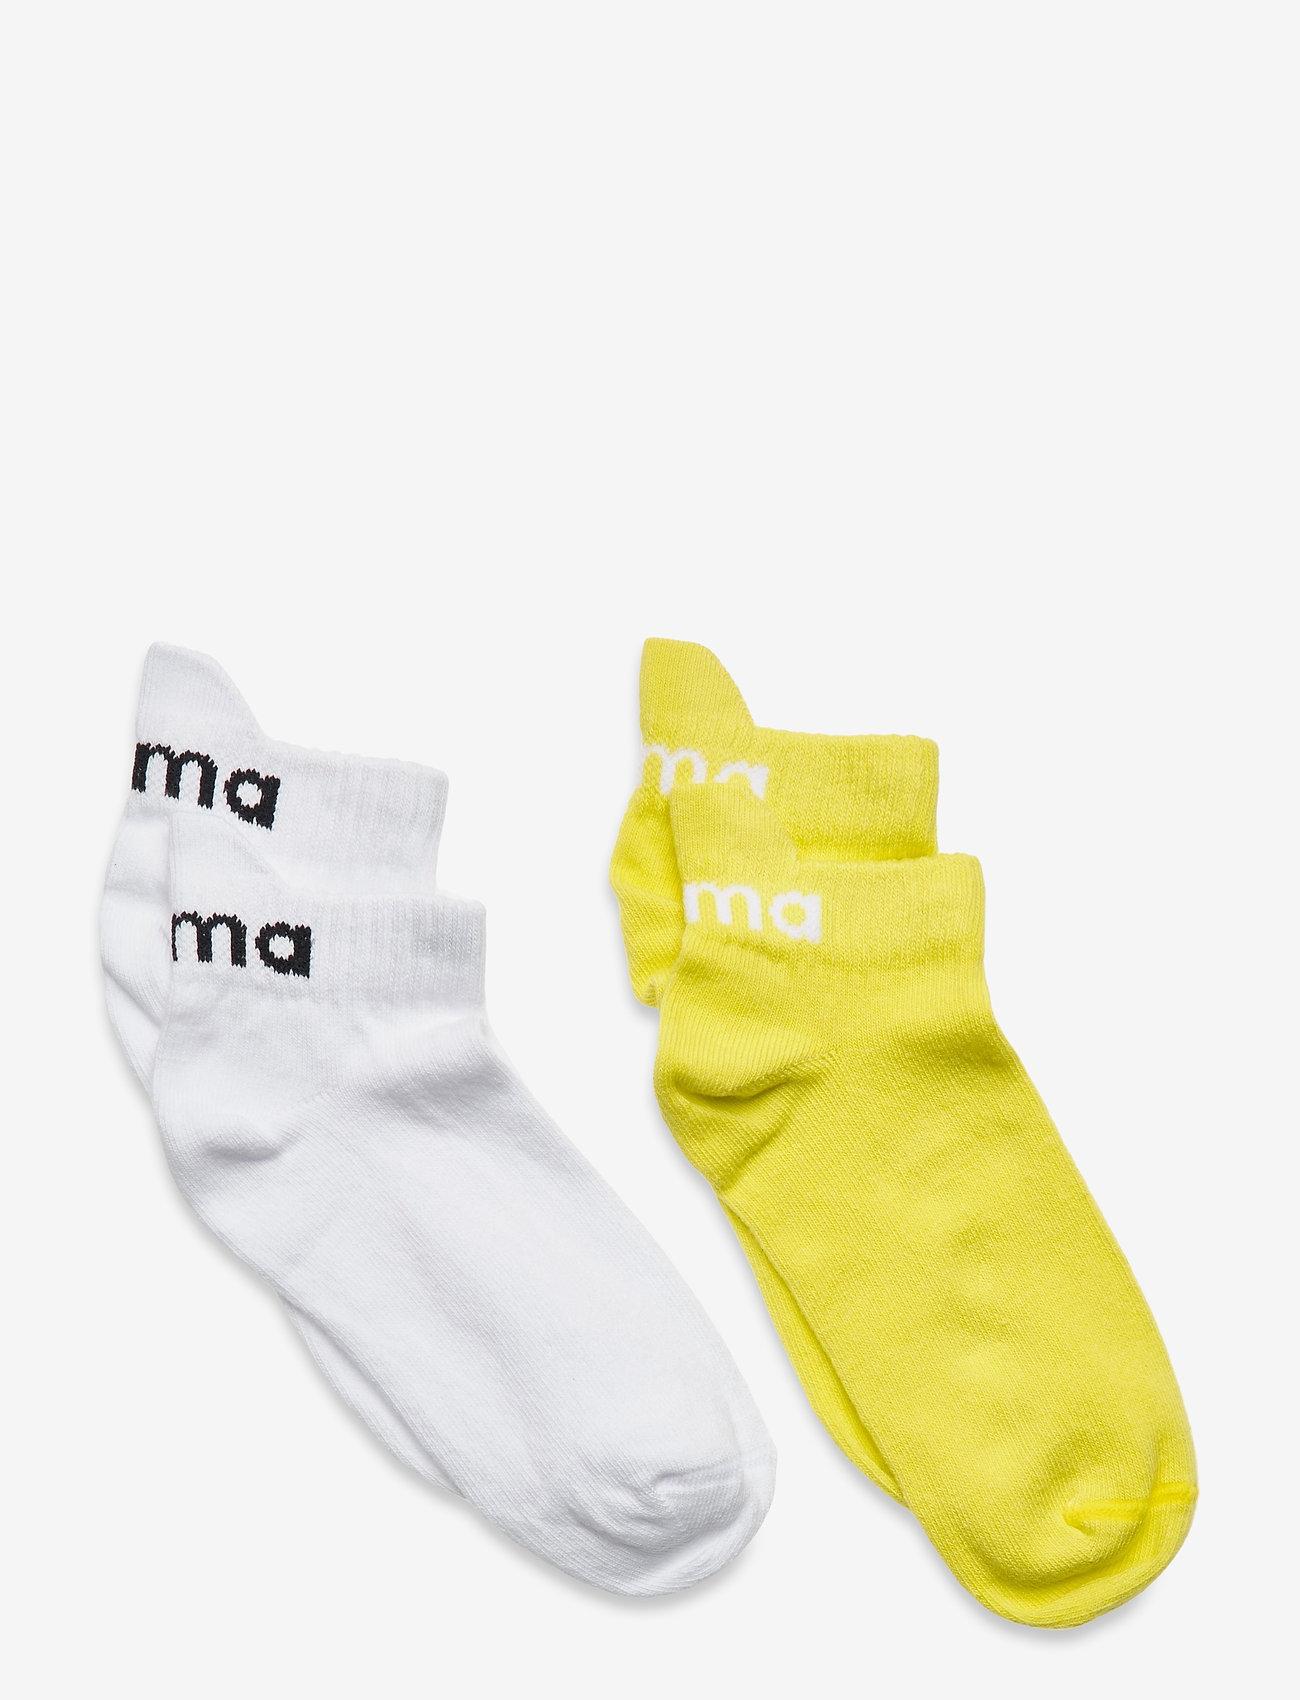 Reima - Vipellys - skarpetki - lemon yellow - 0